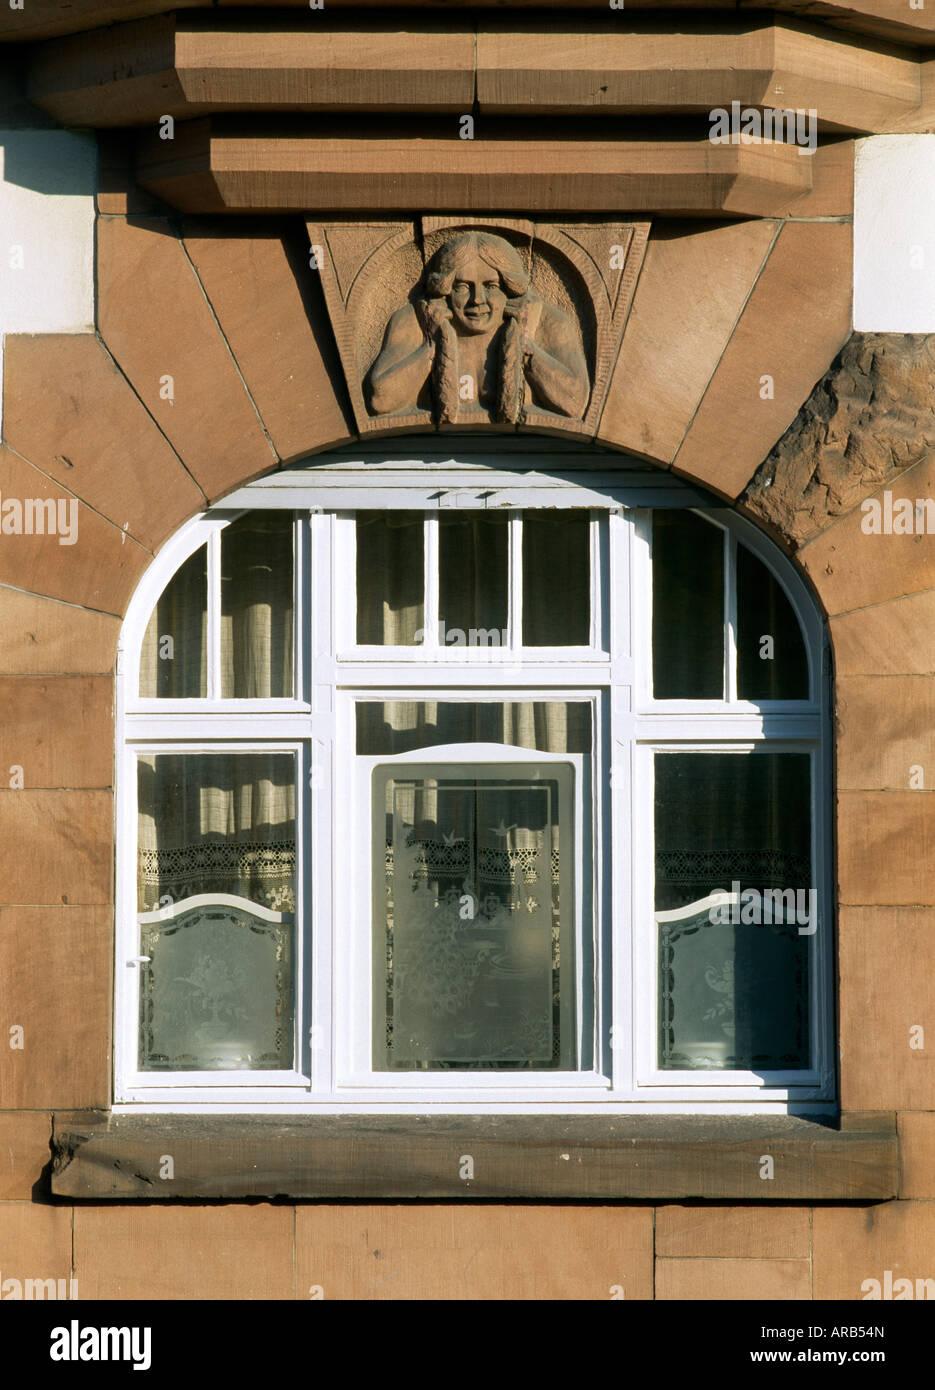 Häuserfassaden Modern düsseldorf oberkassel häuserfassade stock photo 15998468 alamy